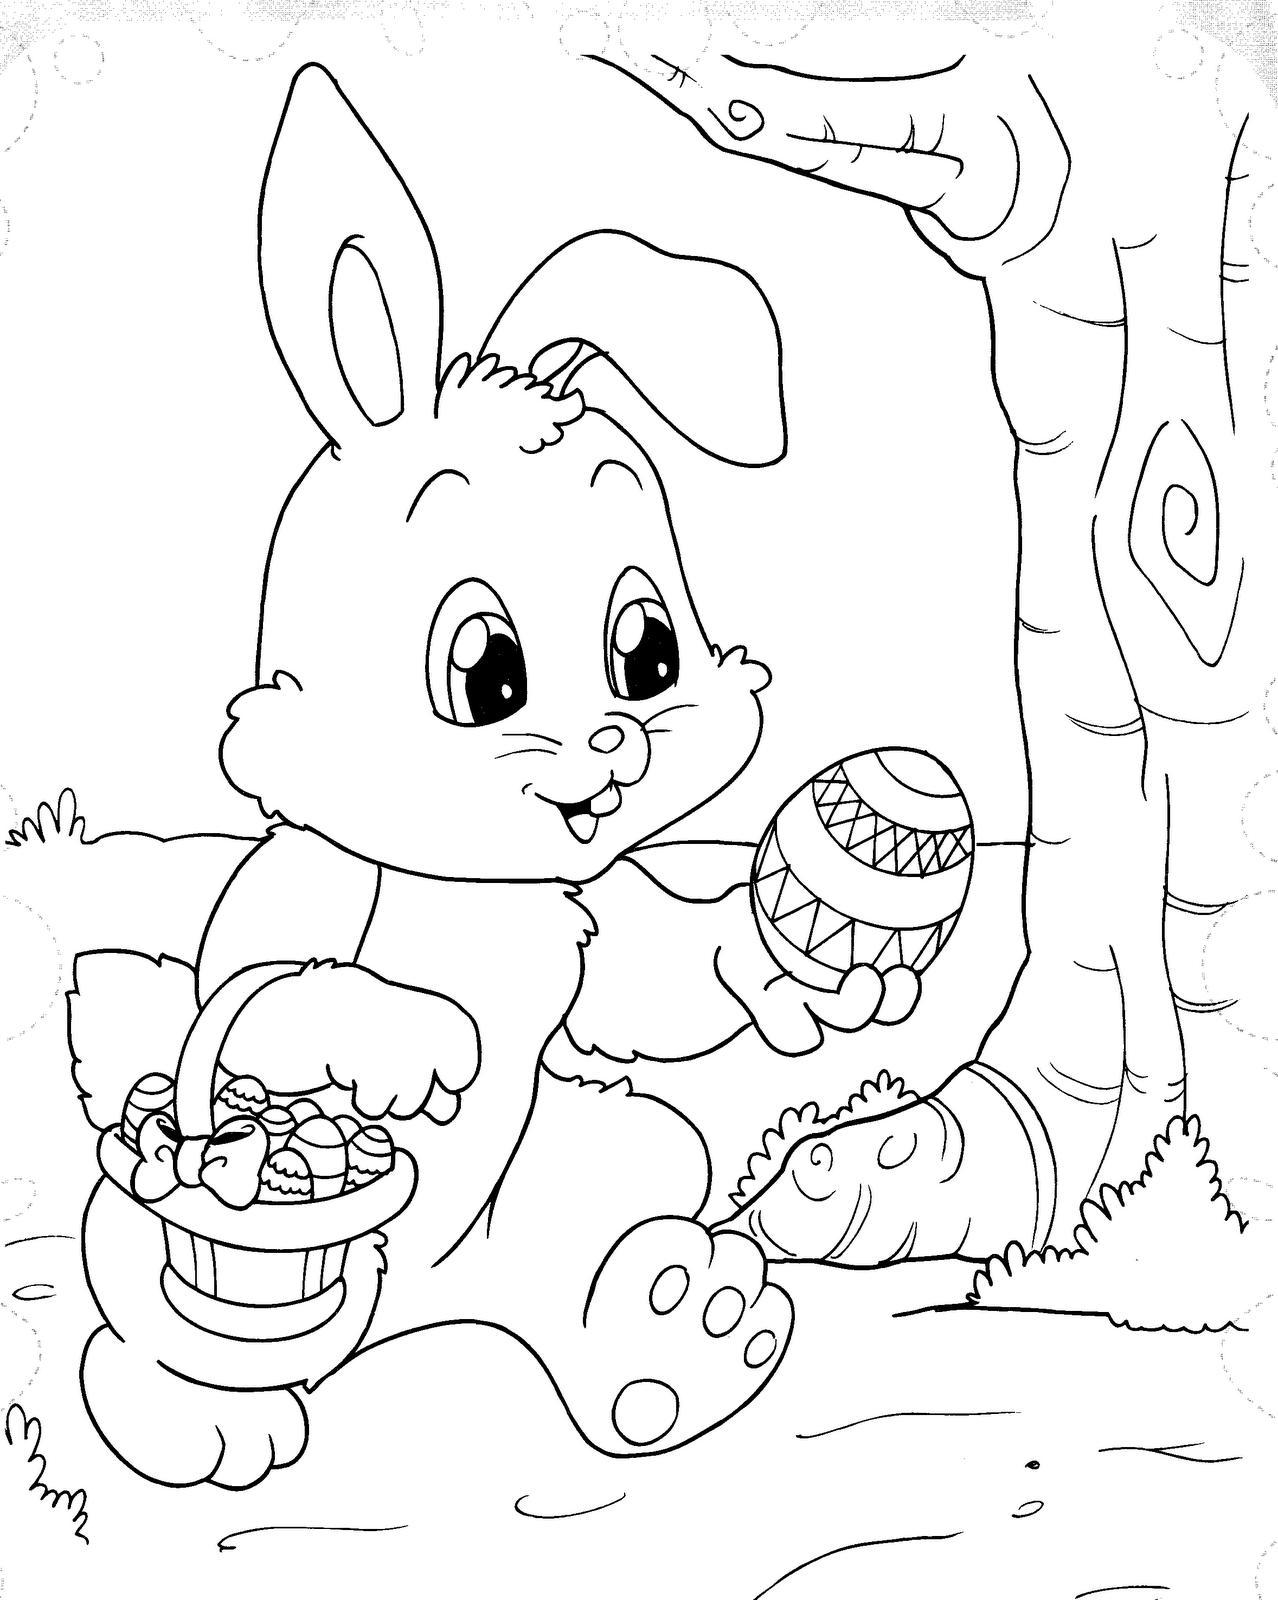 BAÚ DA WEB: Desenhos de Páscoa para colorir, pintar, imprimir ...